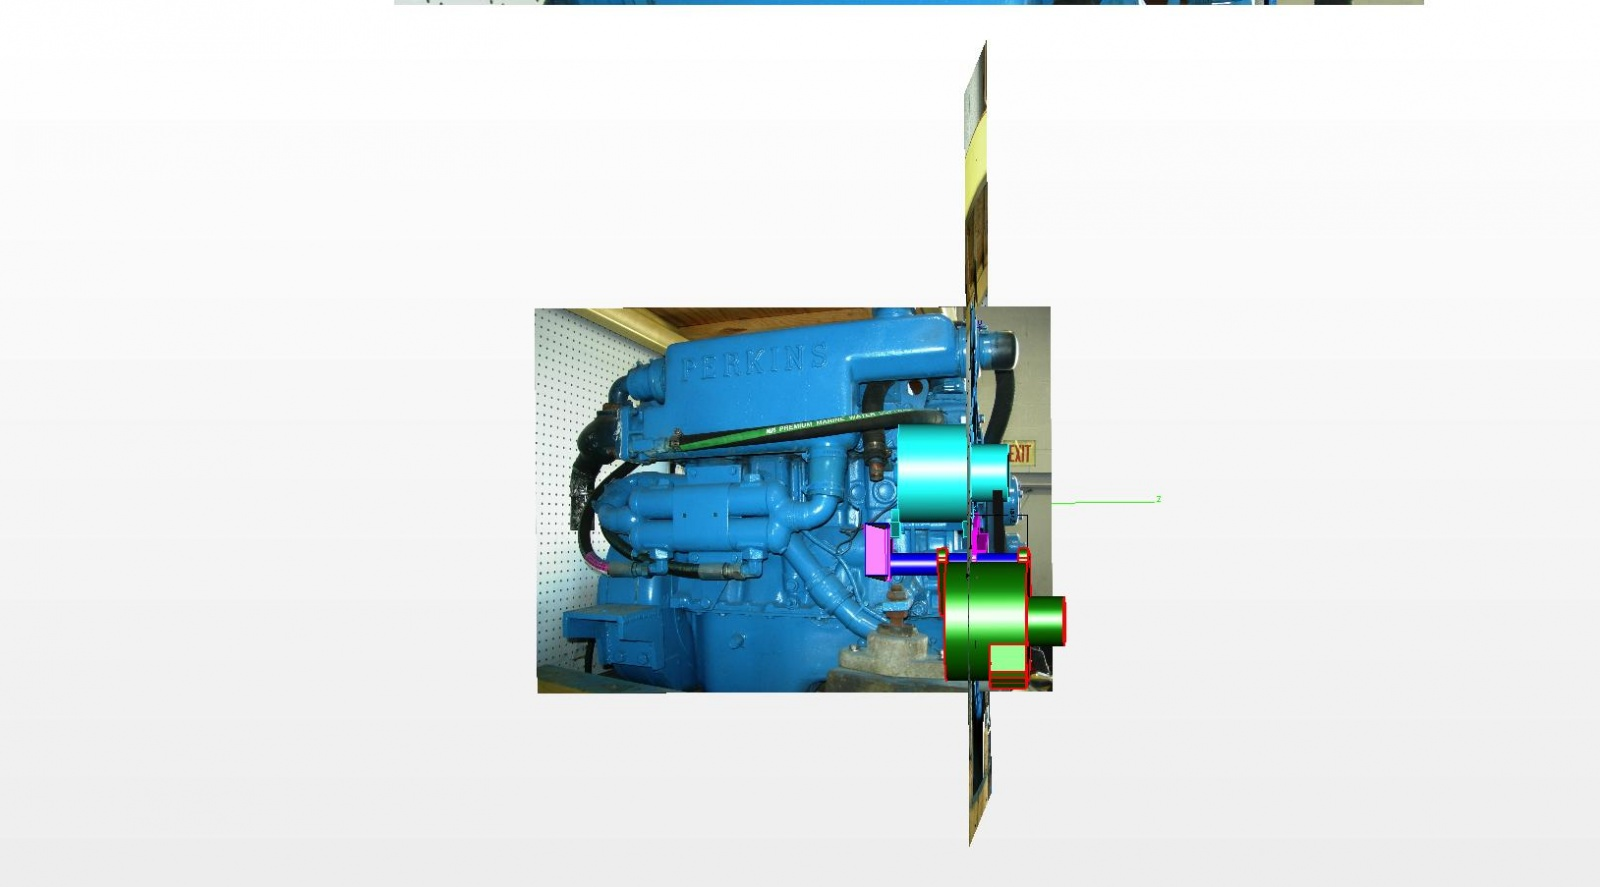 Click image for larger version  Name:dual alternator mount No.21.jpg Views:158 Size:158.3 KB ID:13568